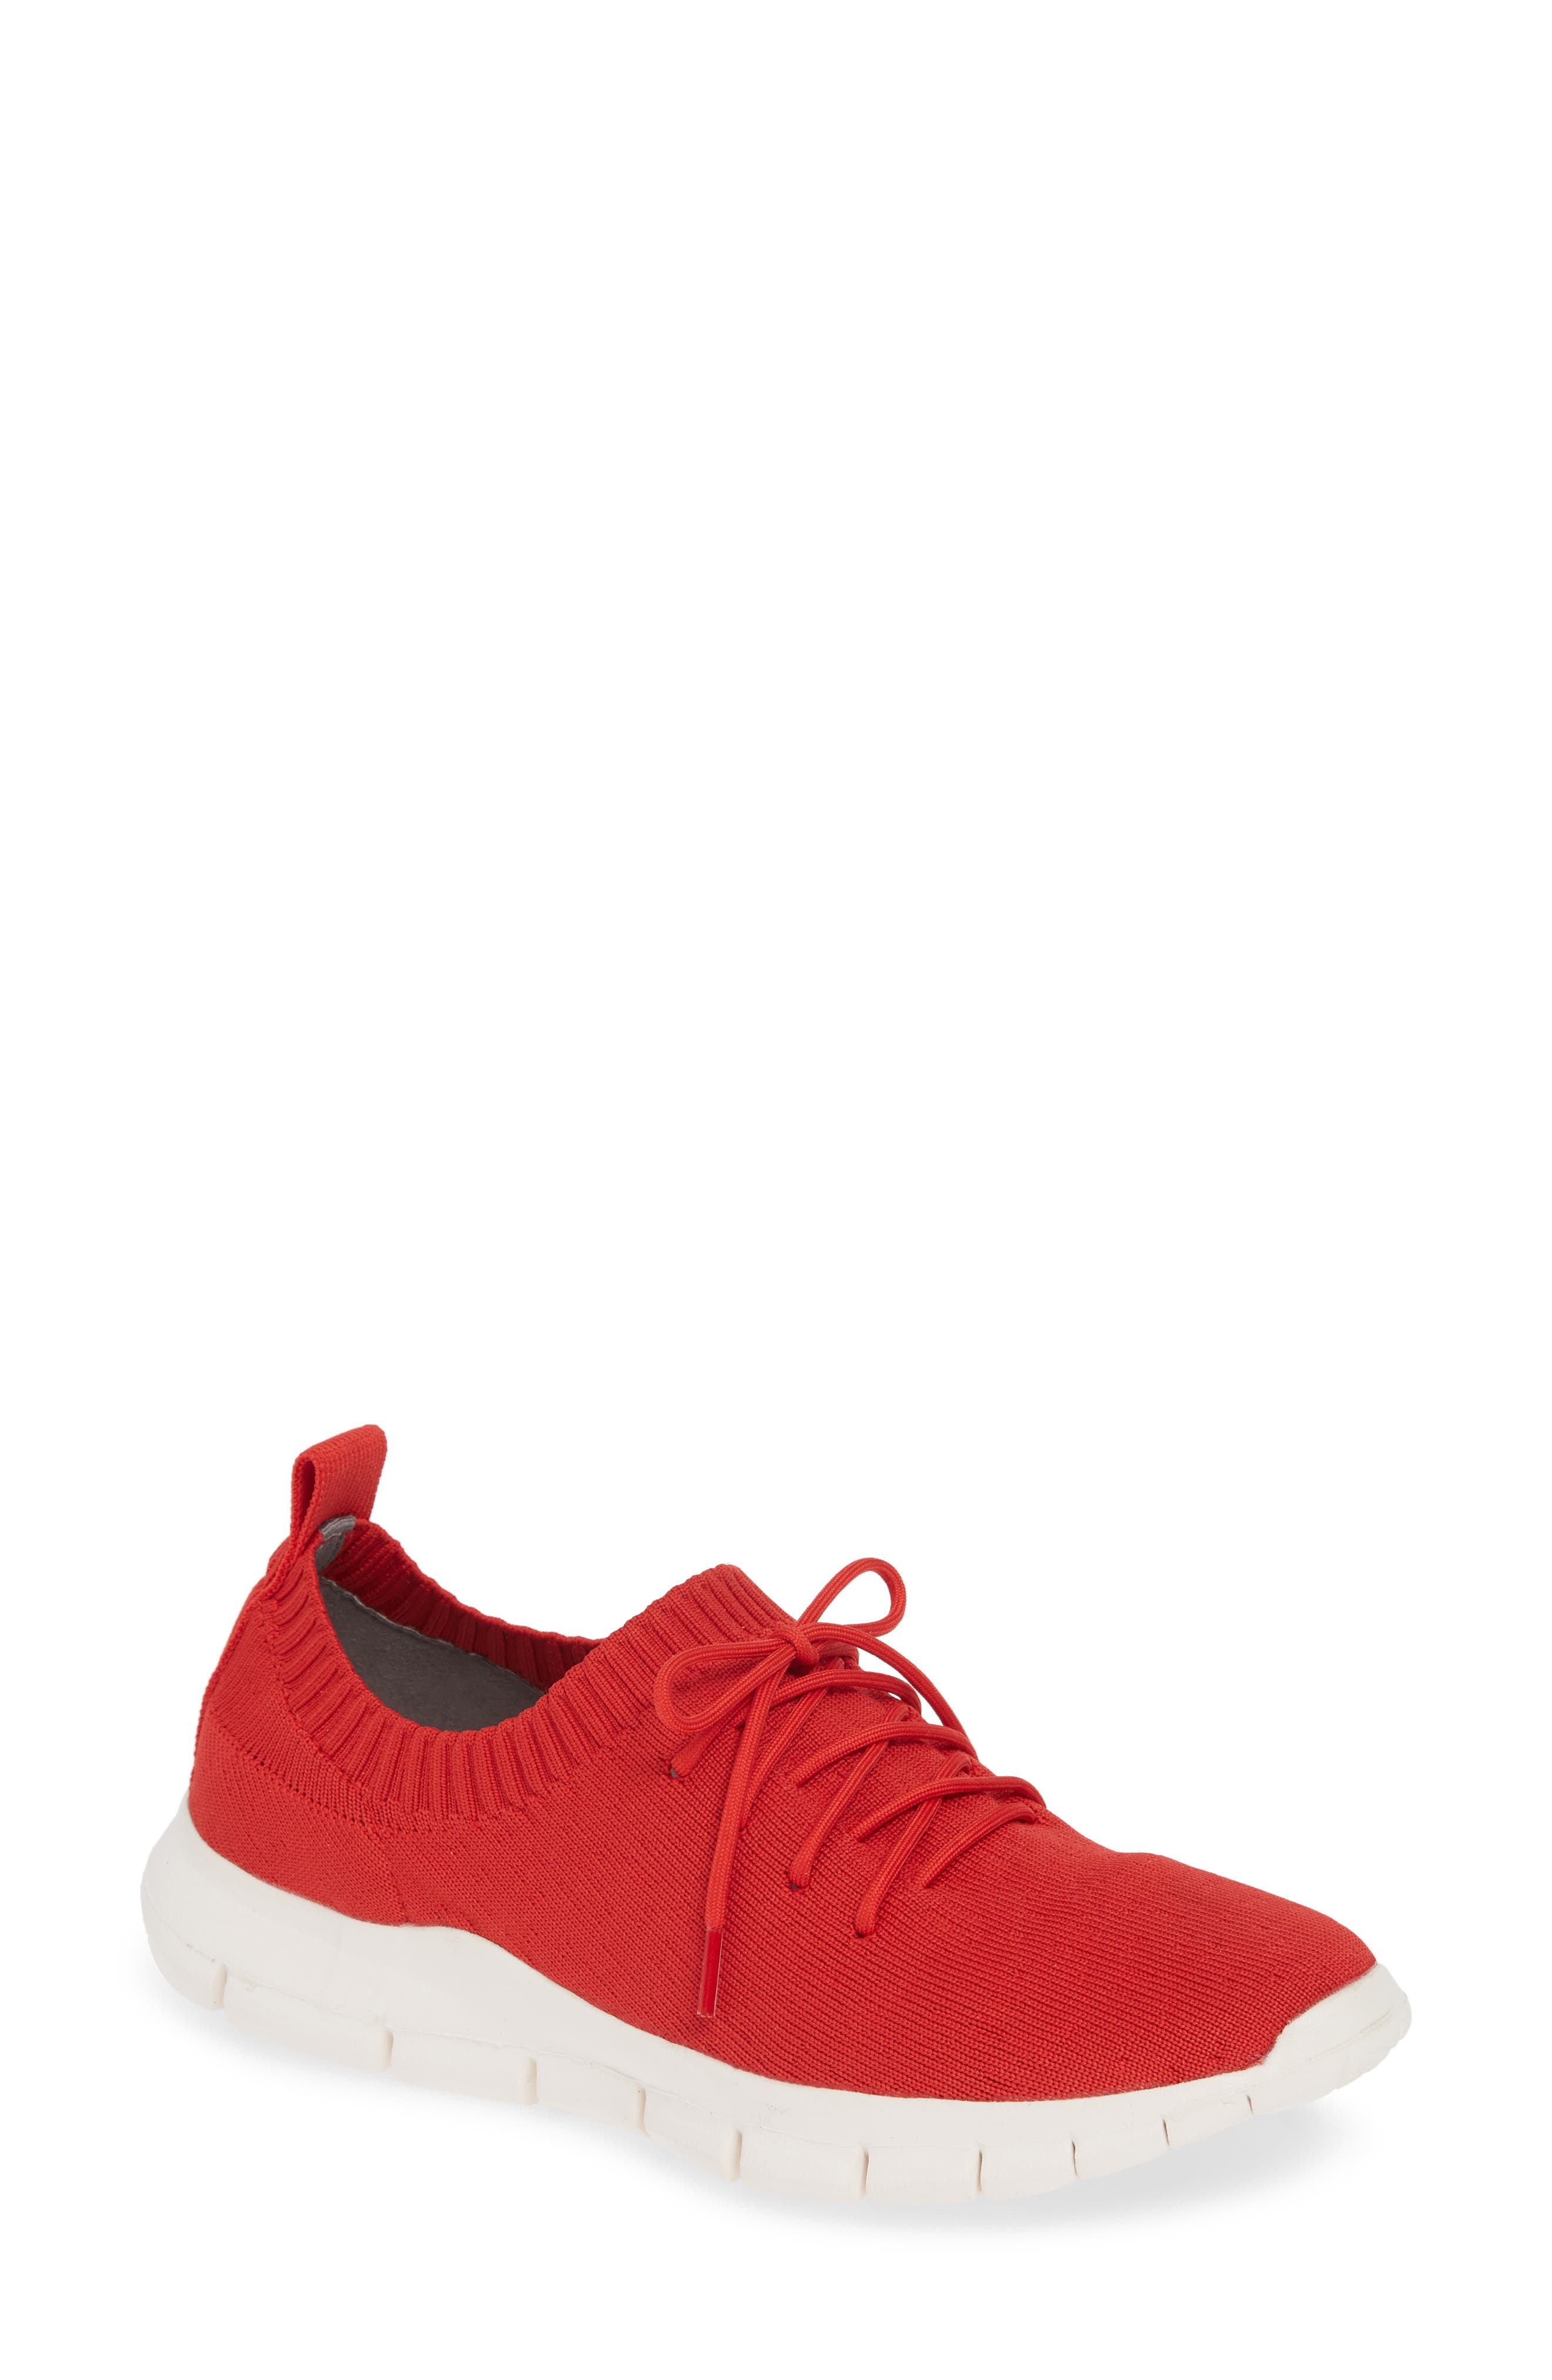 Bernie Mev Plush Sneaker, Red